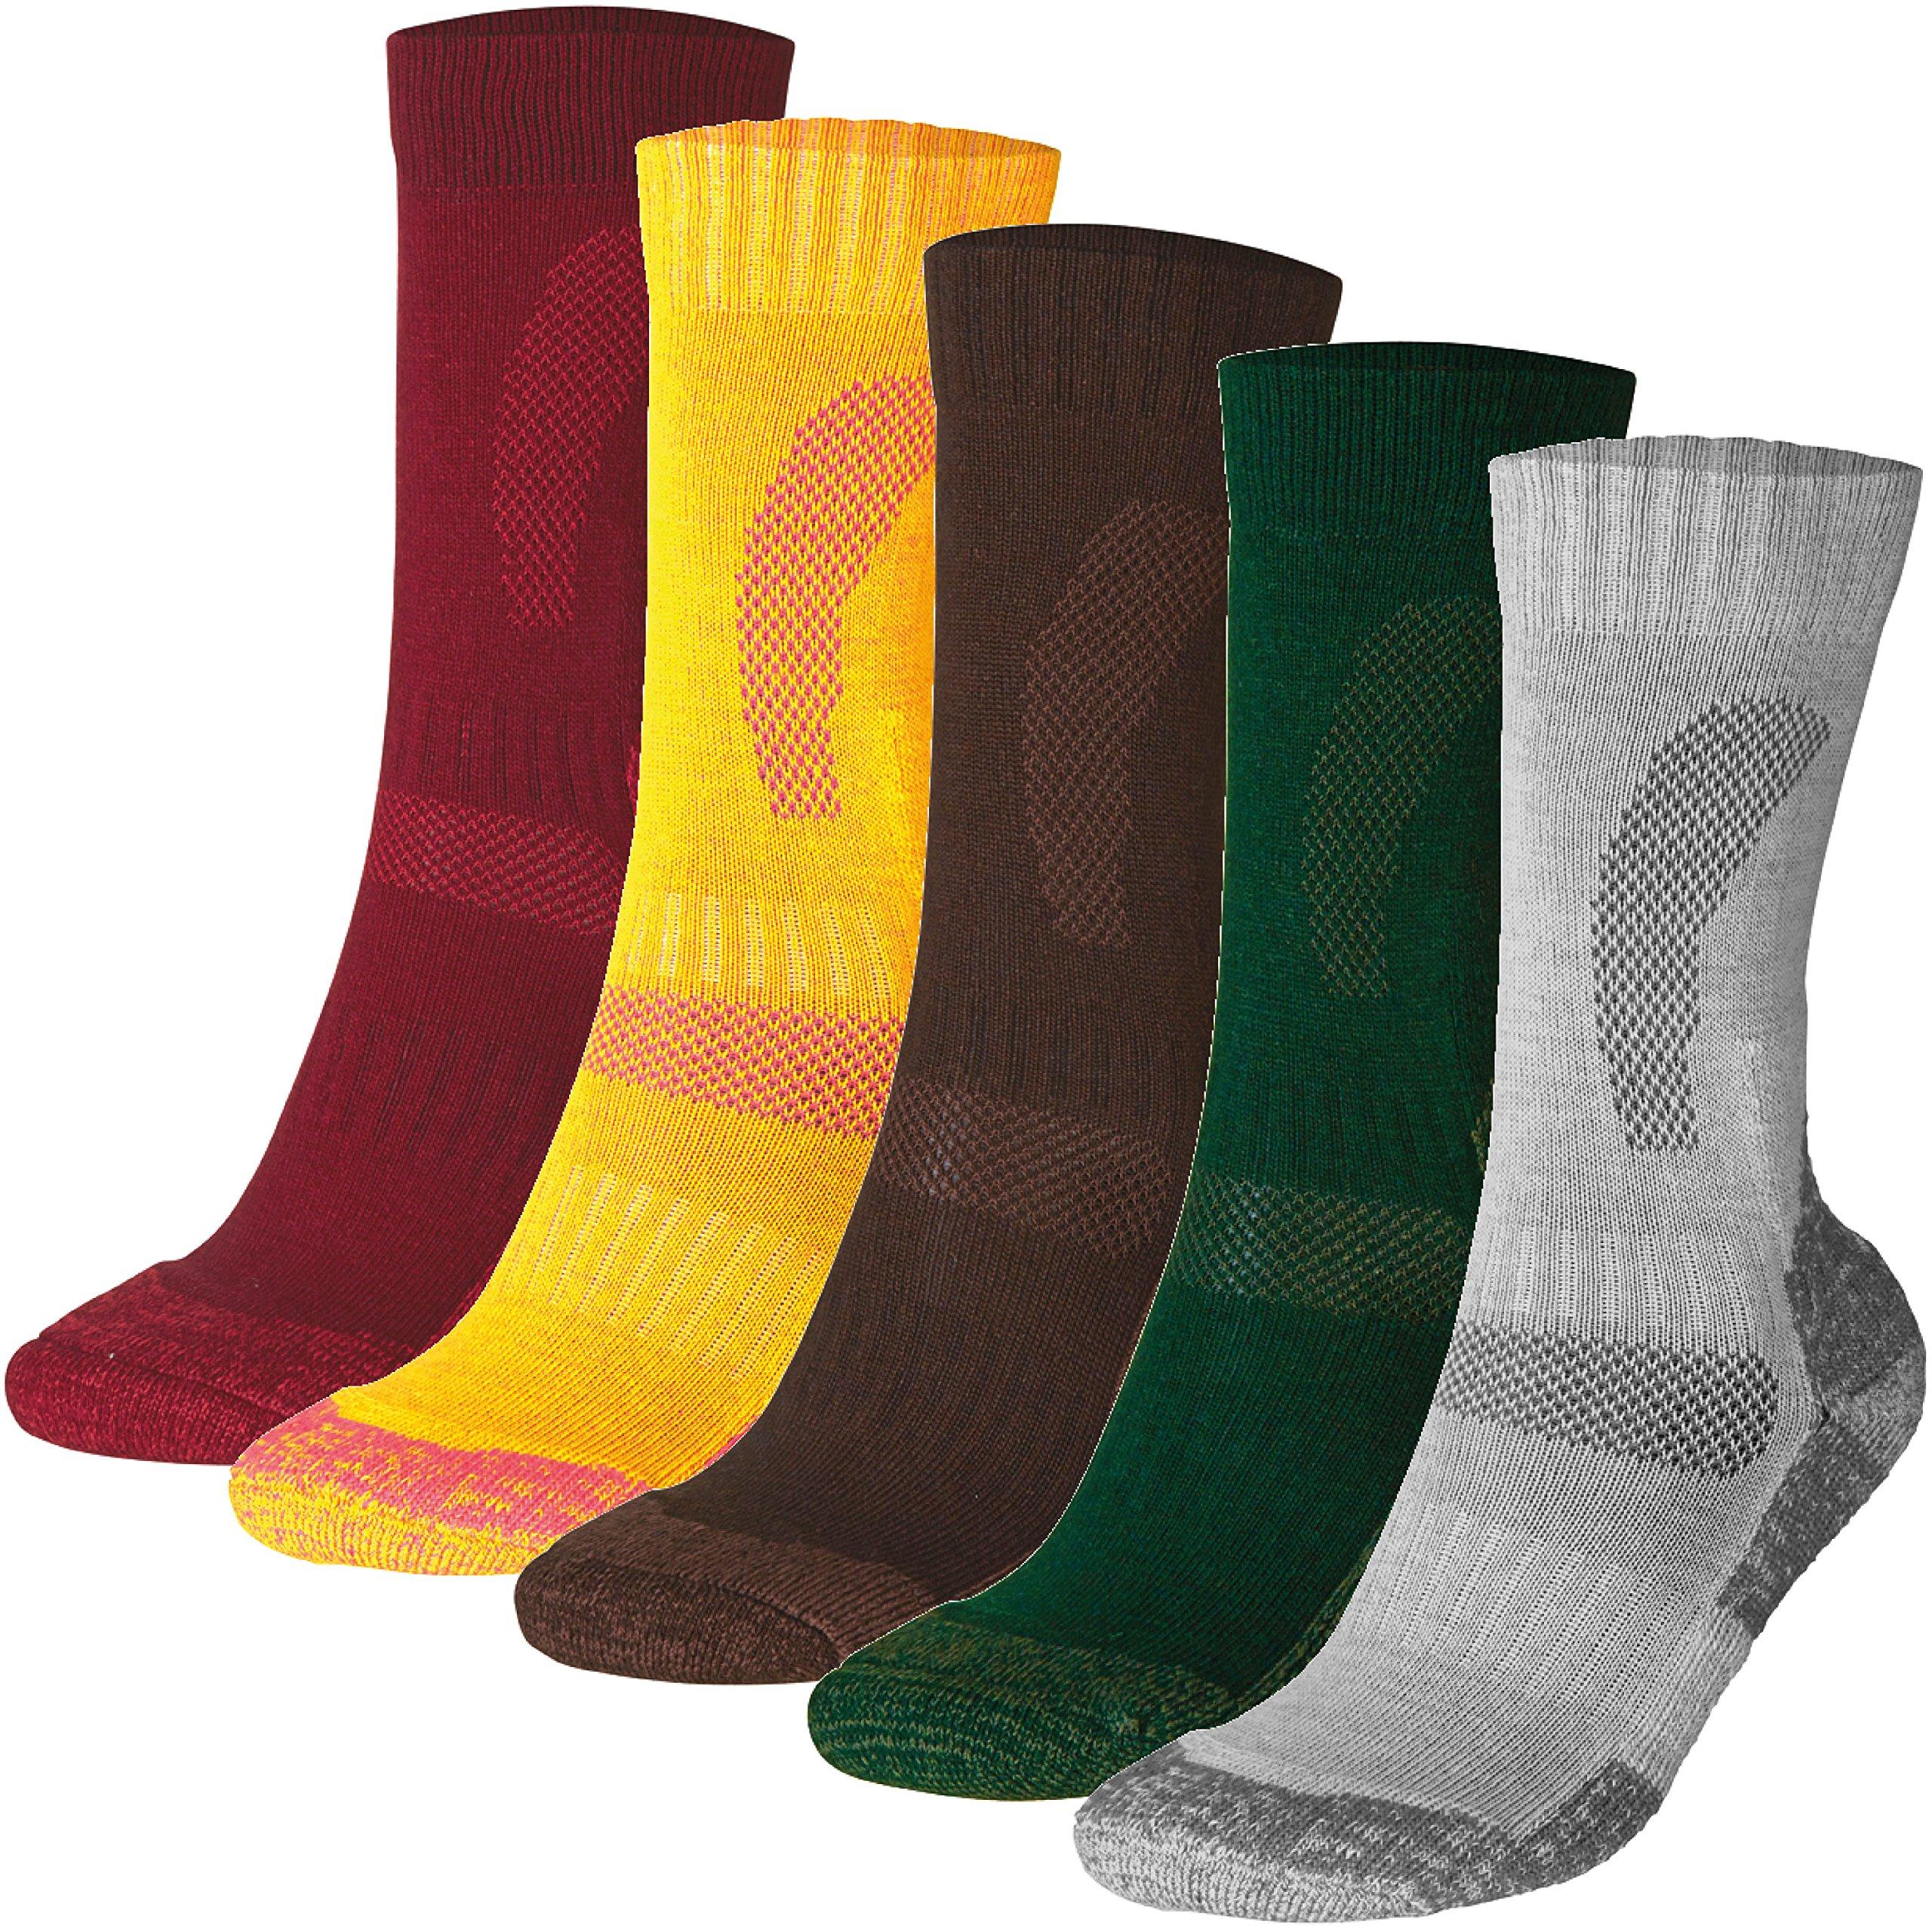 DANISH ENDURANCE Merino Wool Hiking & Trekking Socks (Multicolor: Brown, Red, Green 3 Pairs, US Women 8-10//US Men 6.5-8.5)